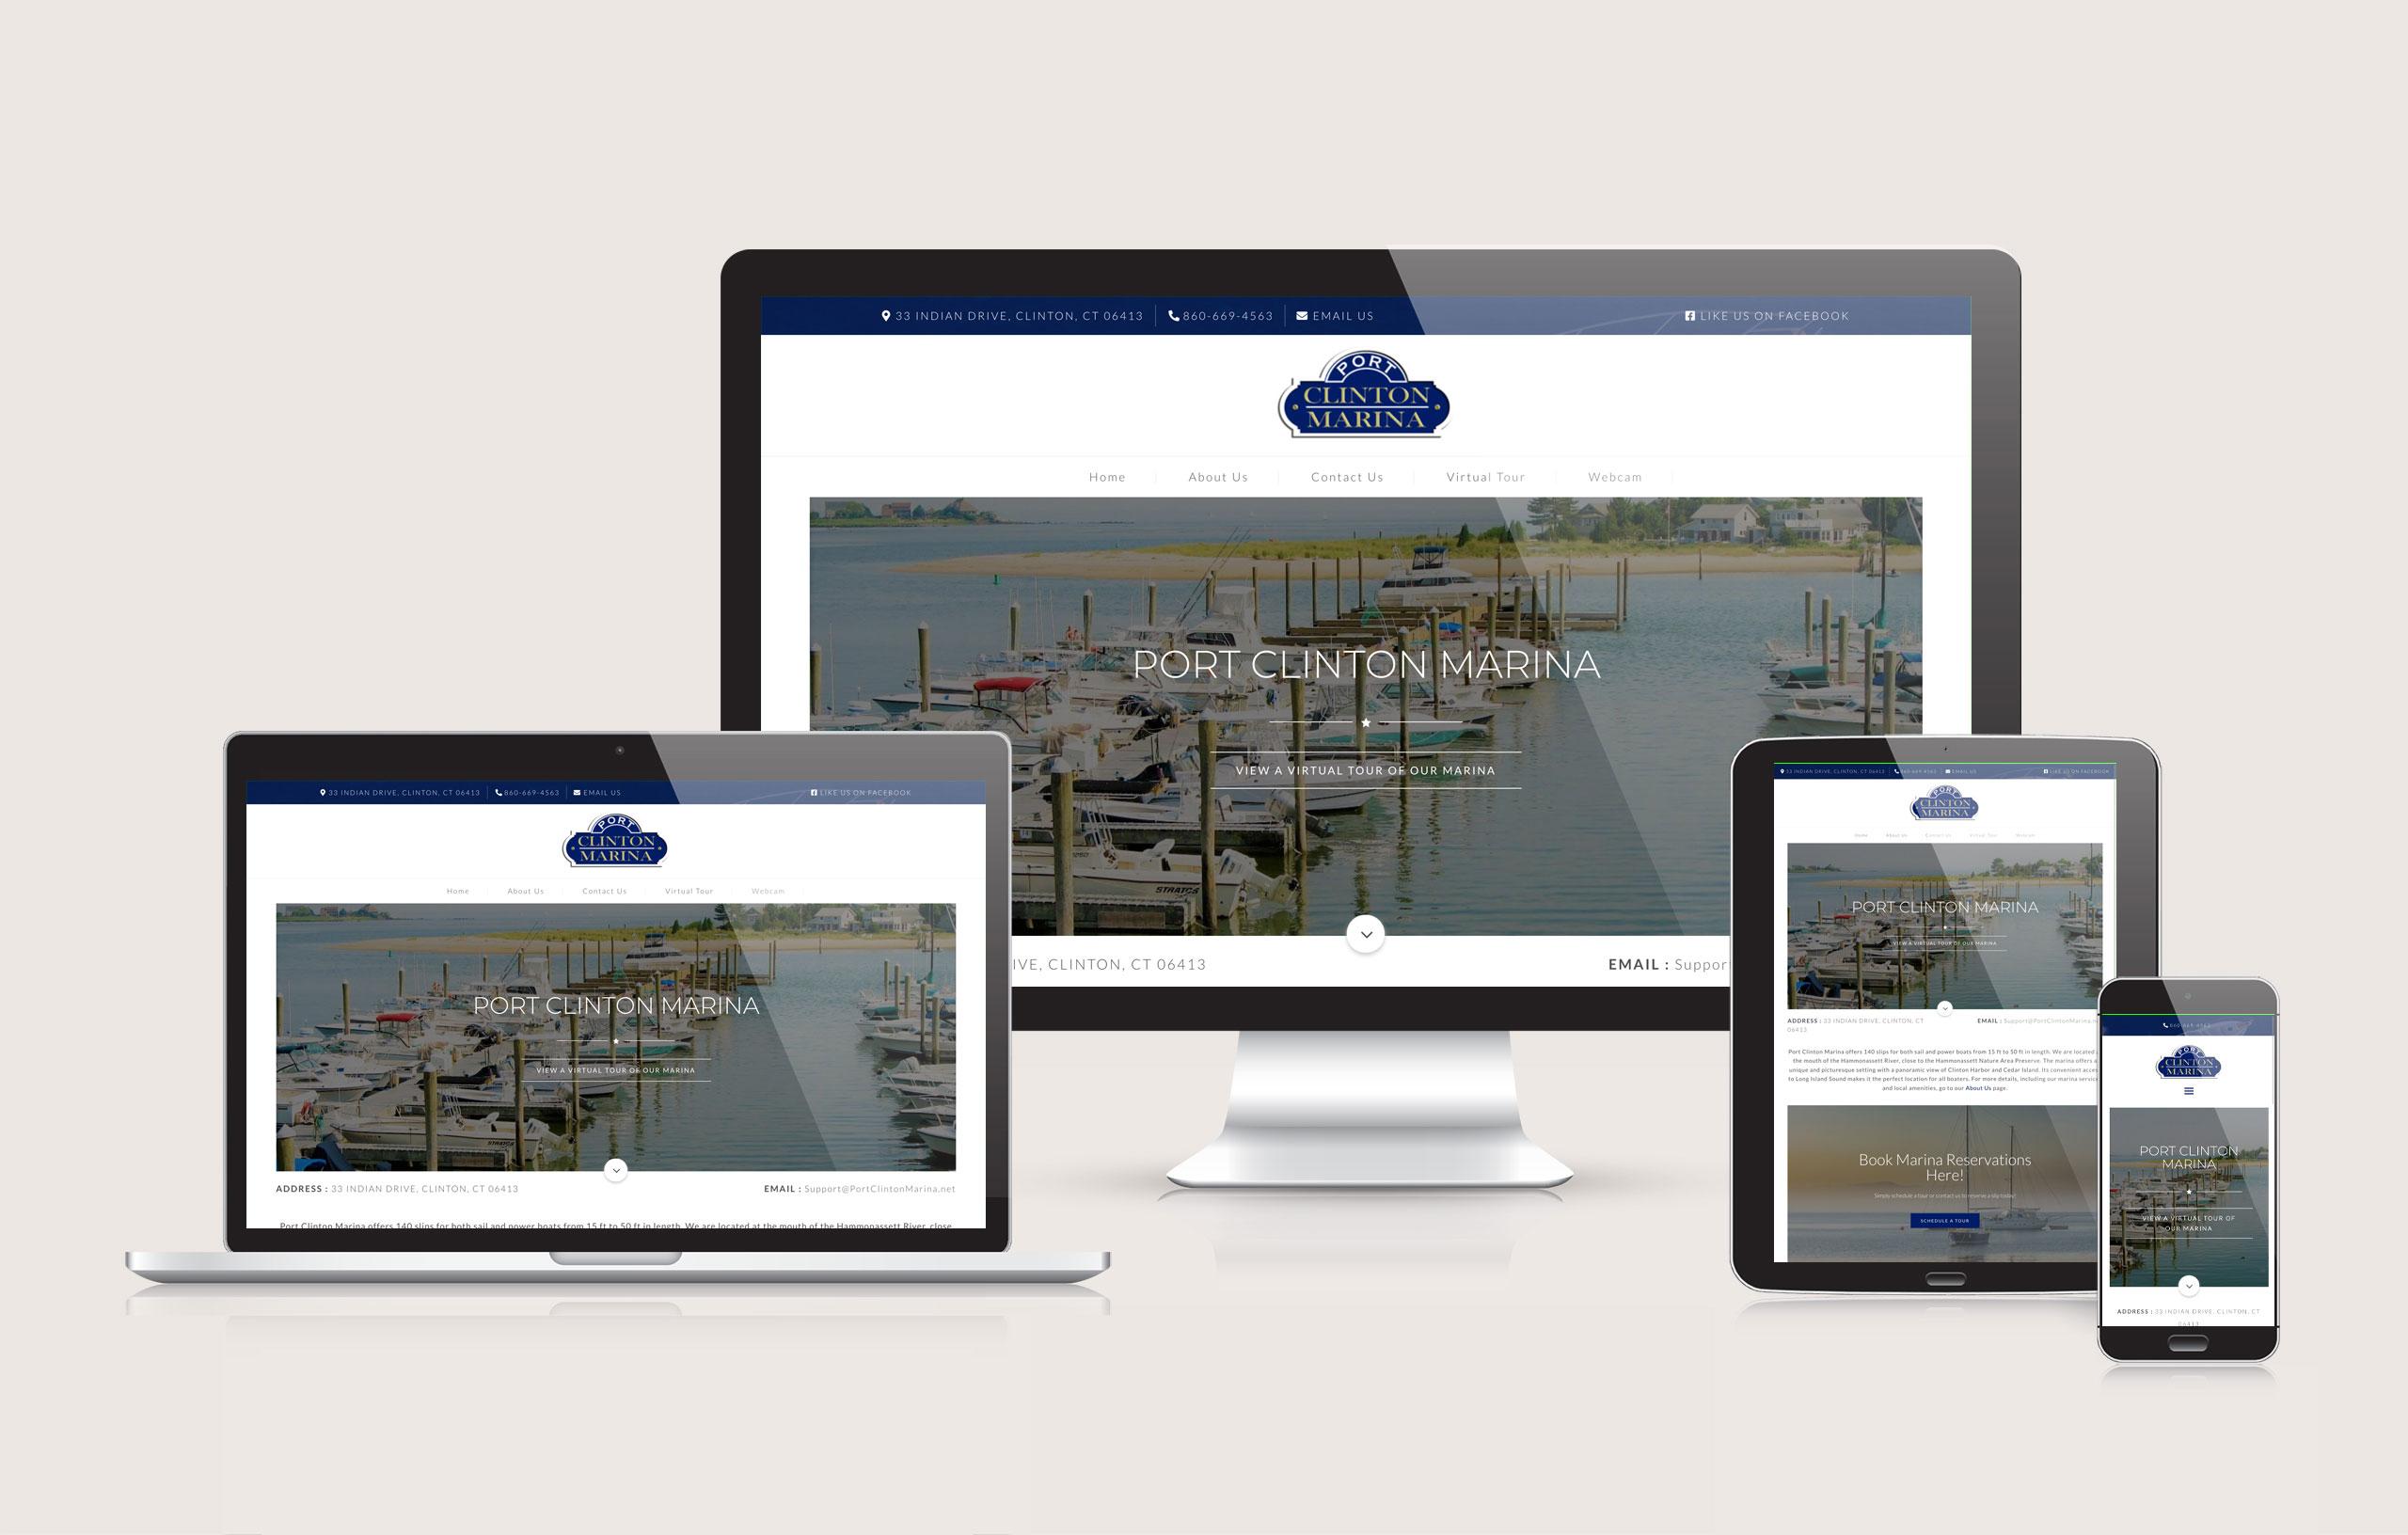 Port Clinton Marina - Website Layout Design